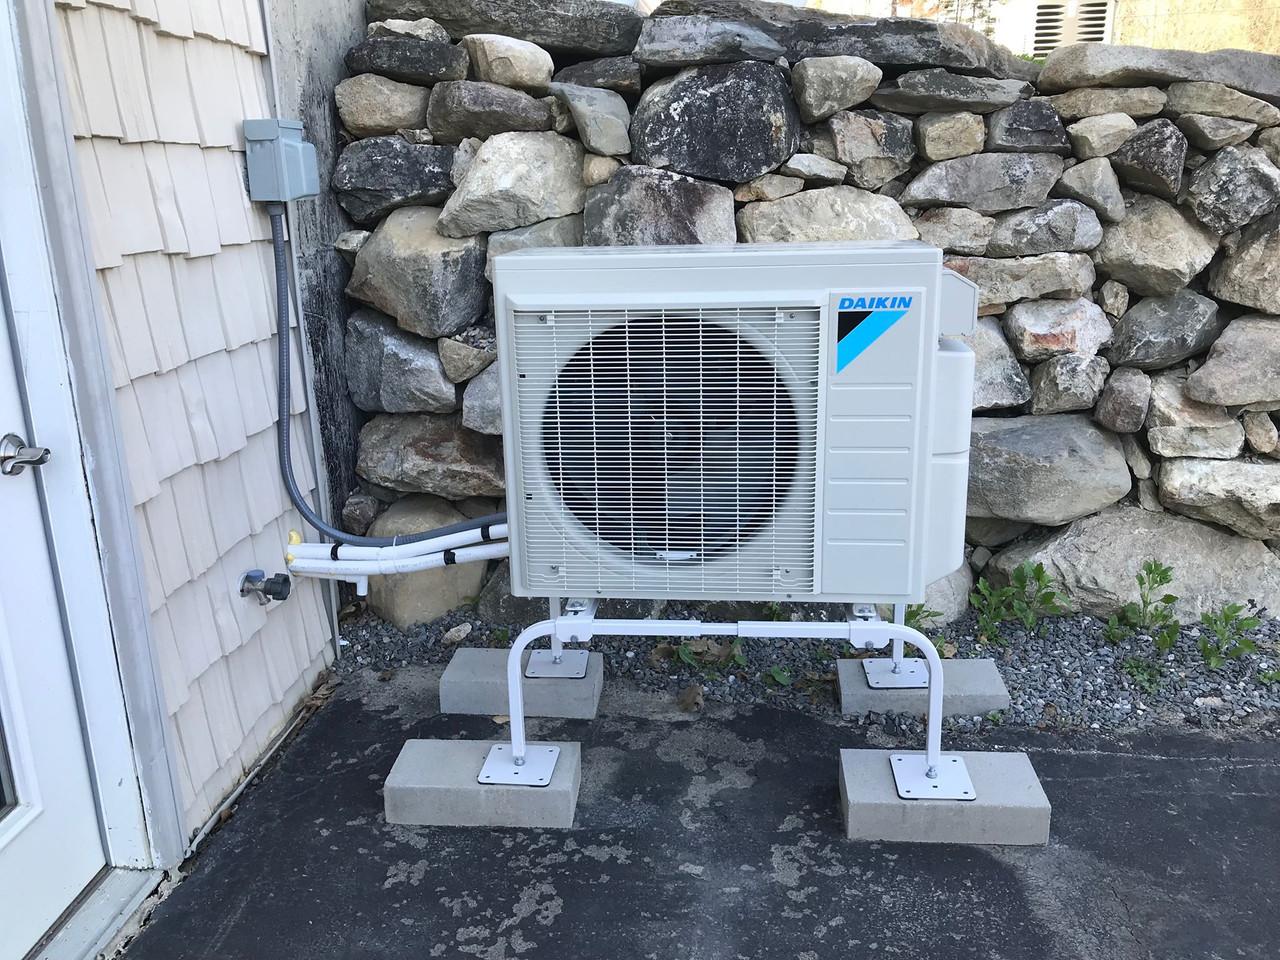 Daikin Outdoor Unit